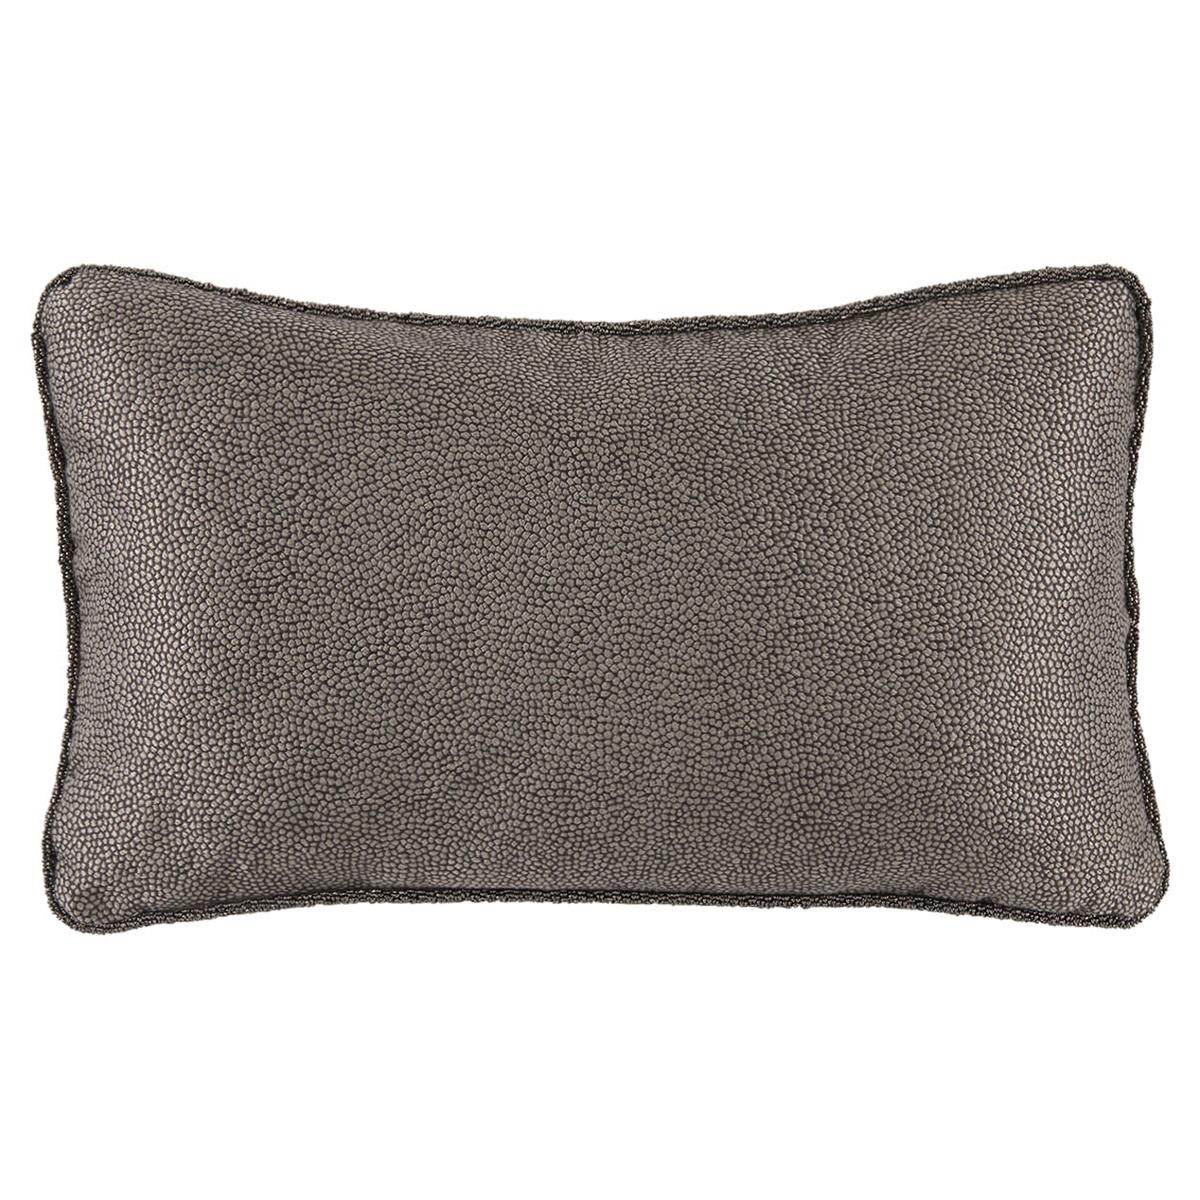 Felix Regency Beaded Cord Charcoal Shagreen Pillow - 13x22